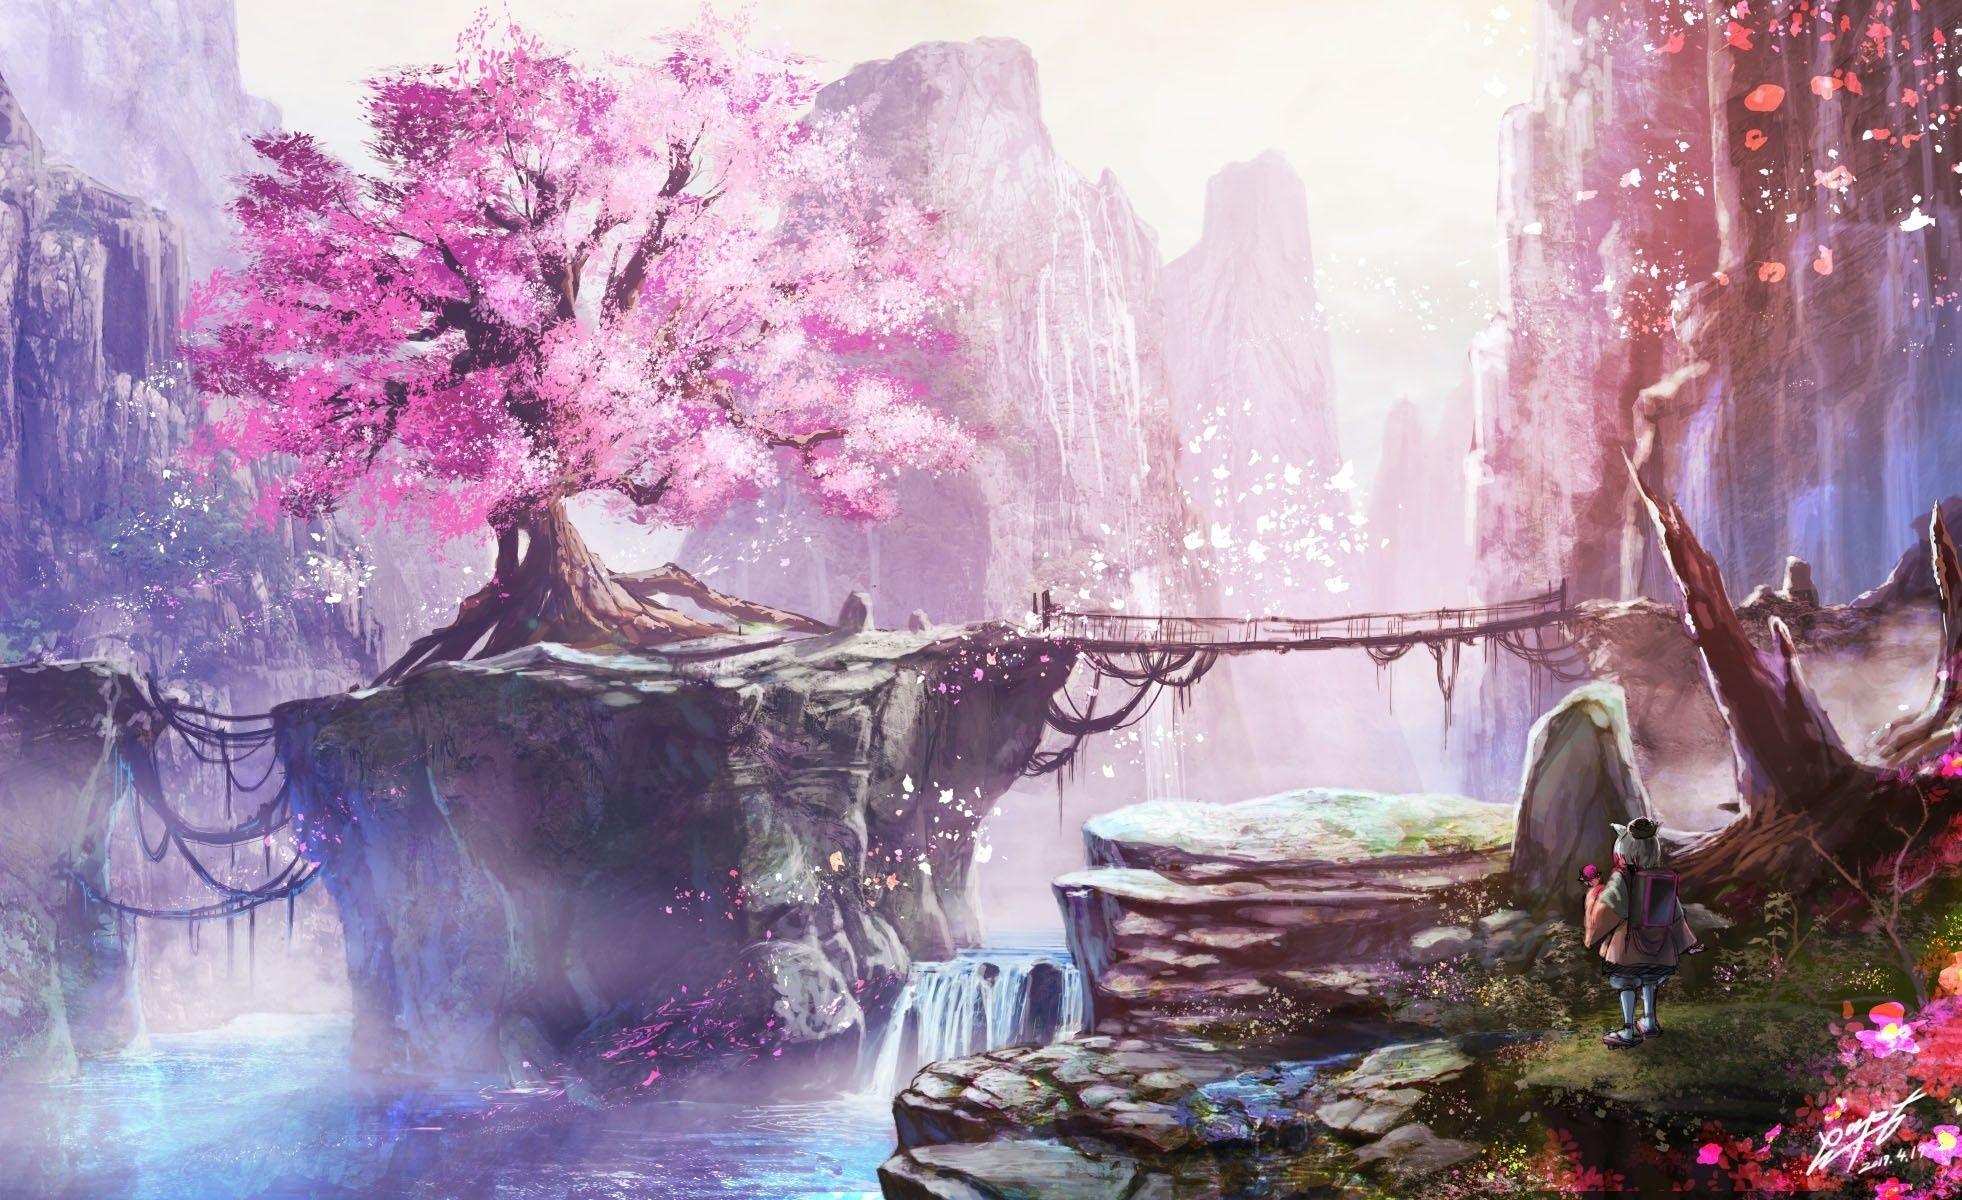 Pin By Aurora S Dreams On Beautiful Art Anime Cherry Blossom Cherry Blossom Wallpaper Cherry Blossom Art